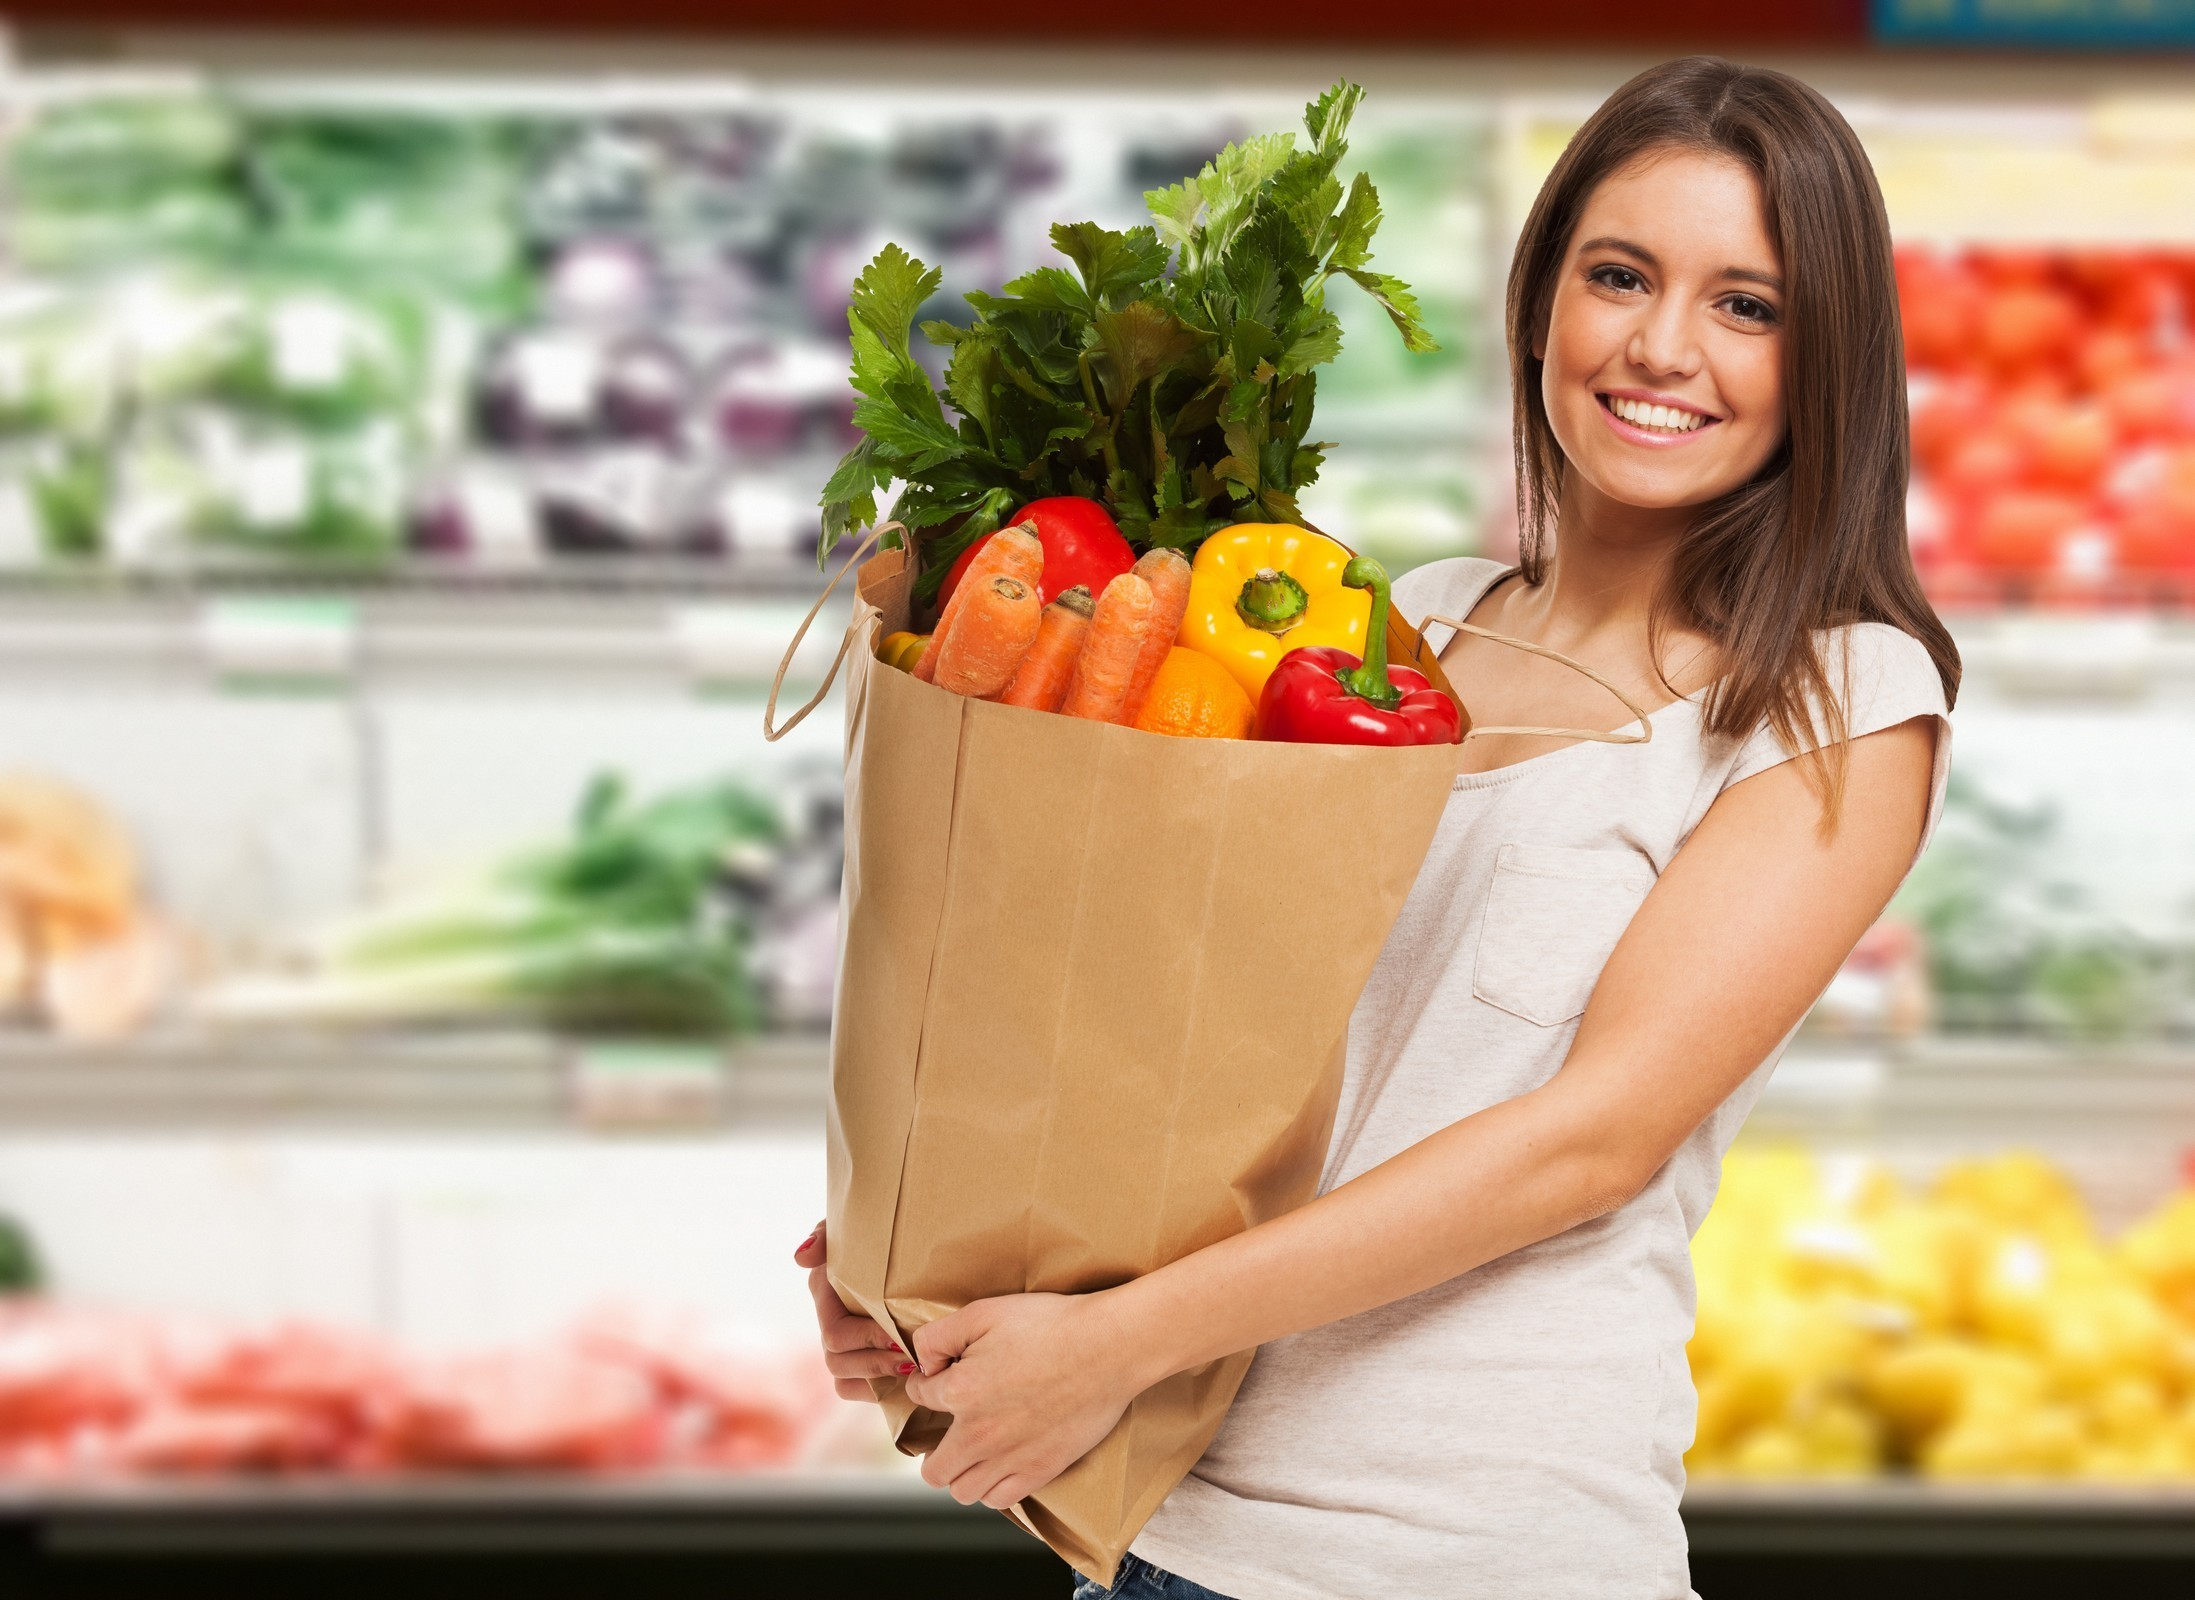 Nederlandse supermarkt in Spanje